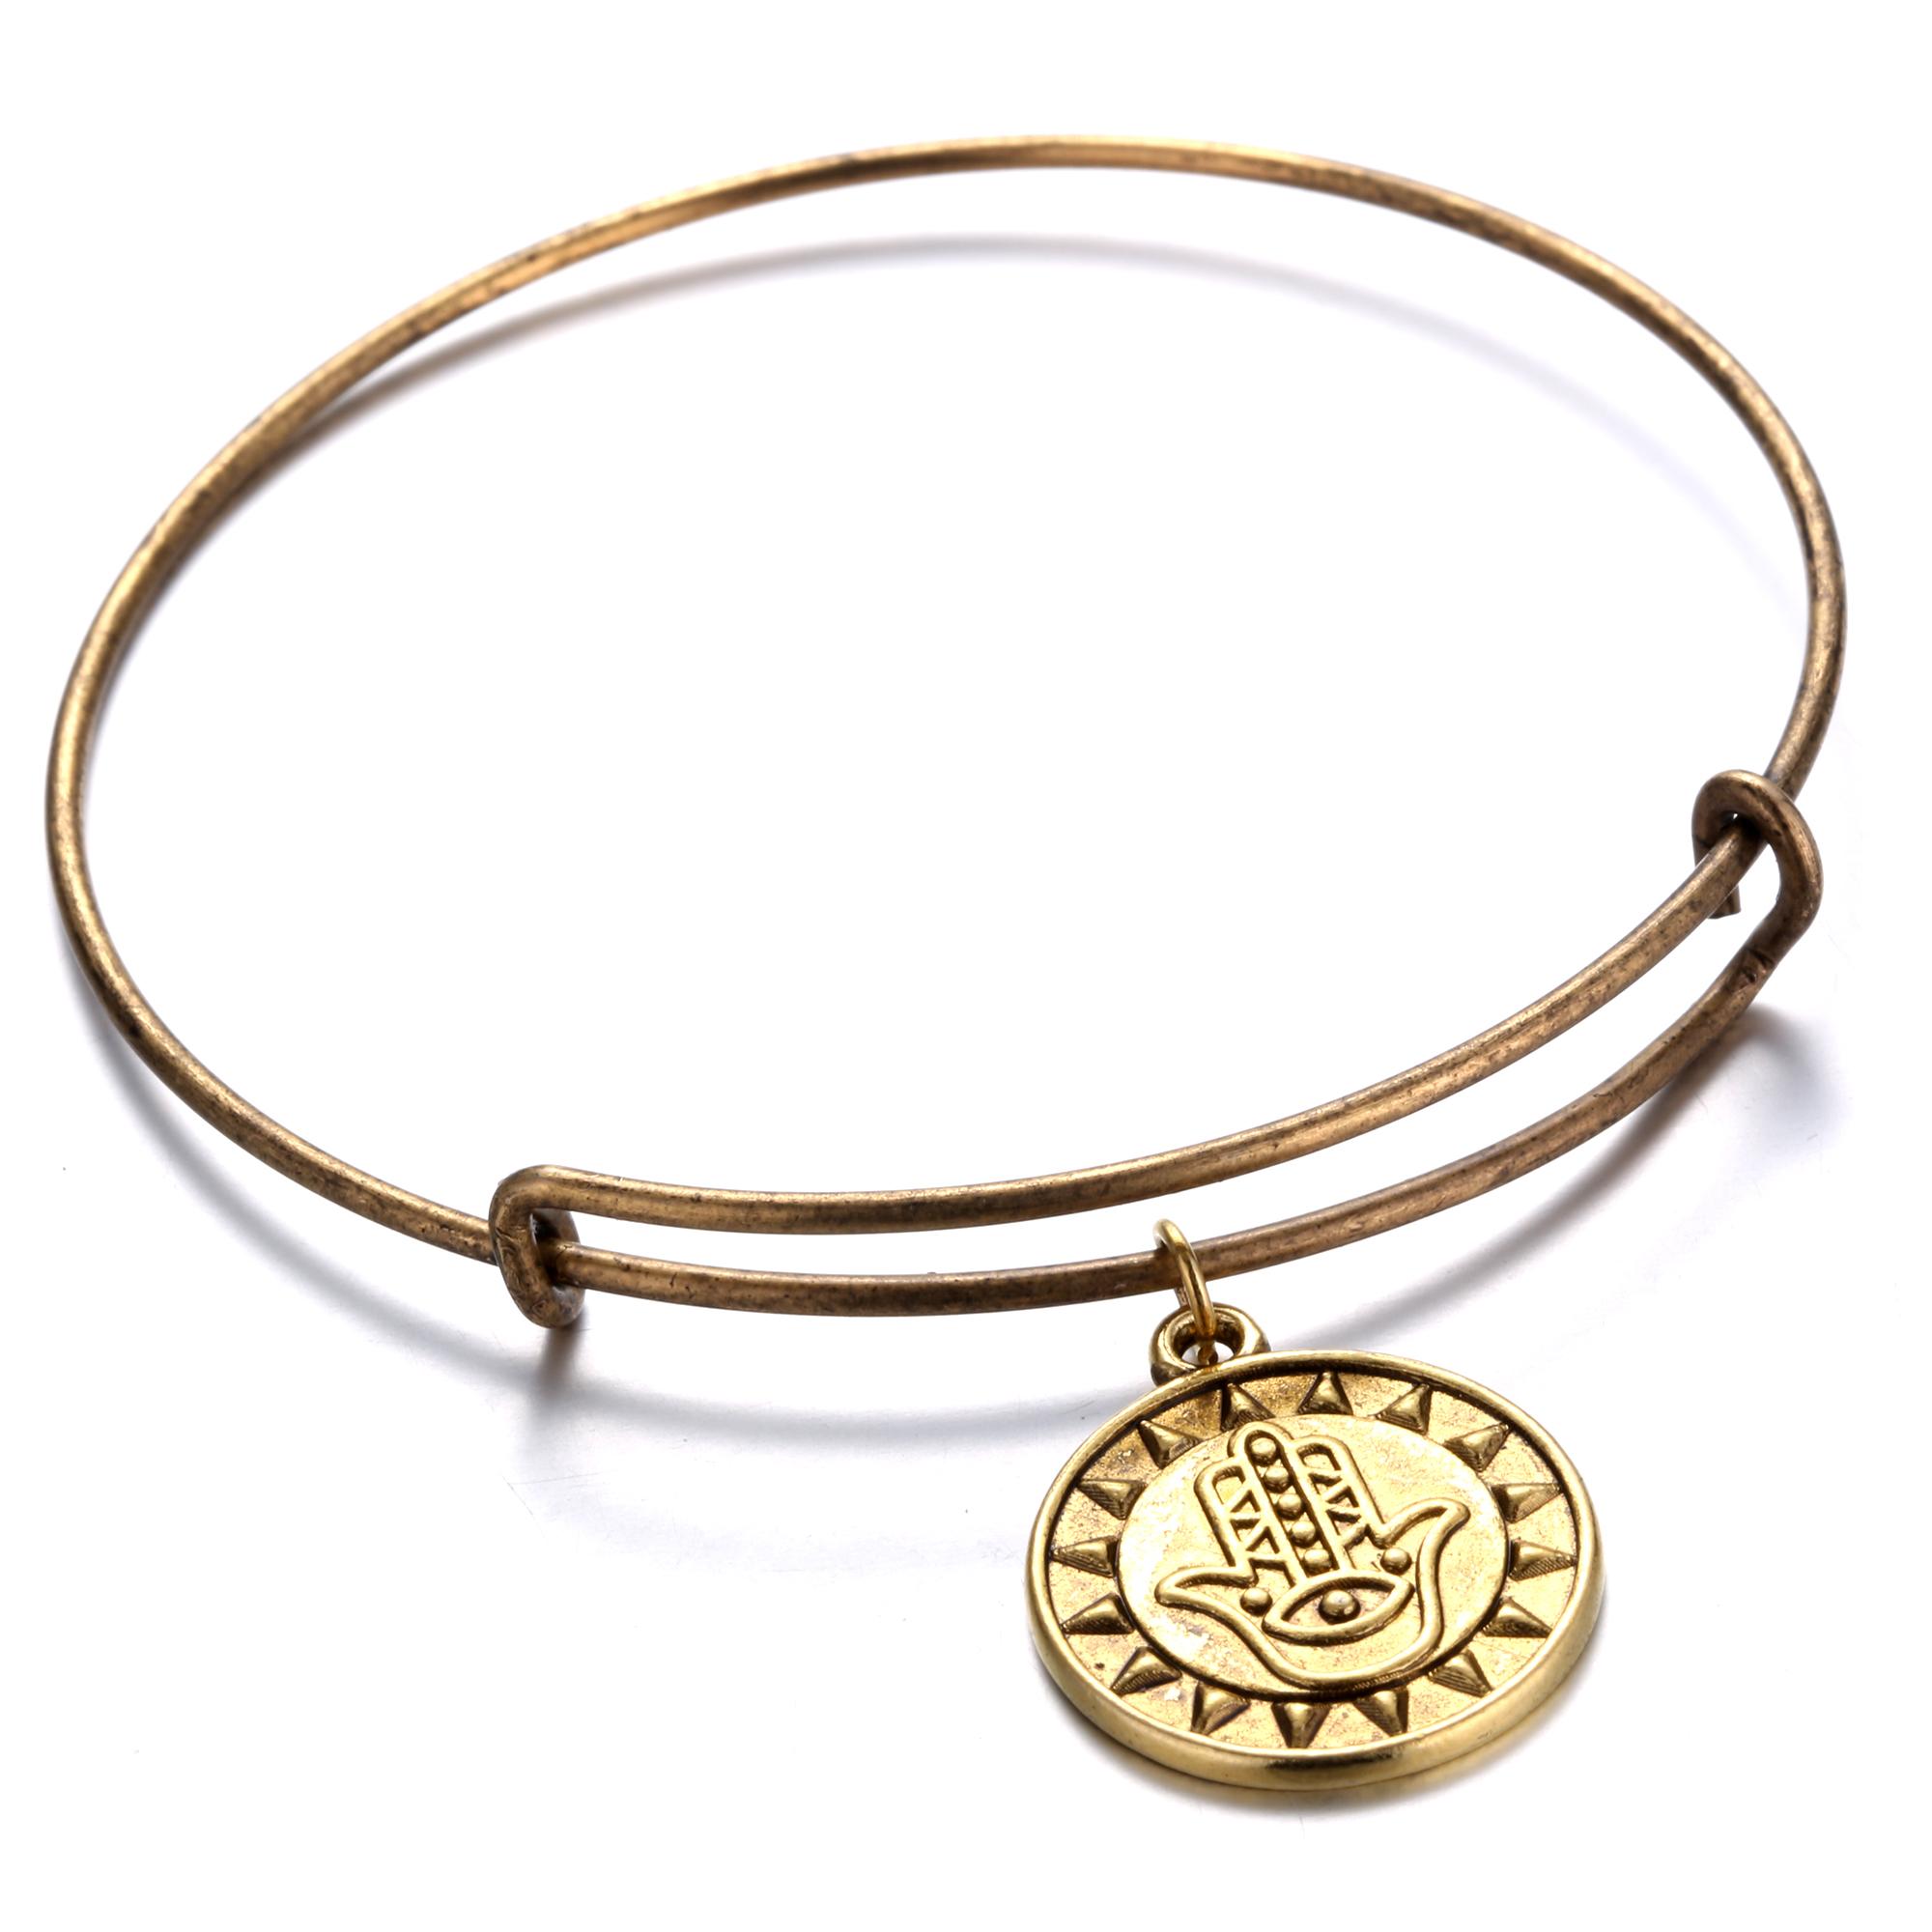 New Jewelry Charm Bangle Fashion Silver & Gold Plated Bracelet Women Wrist Gift